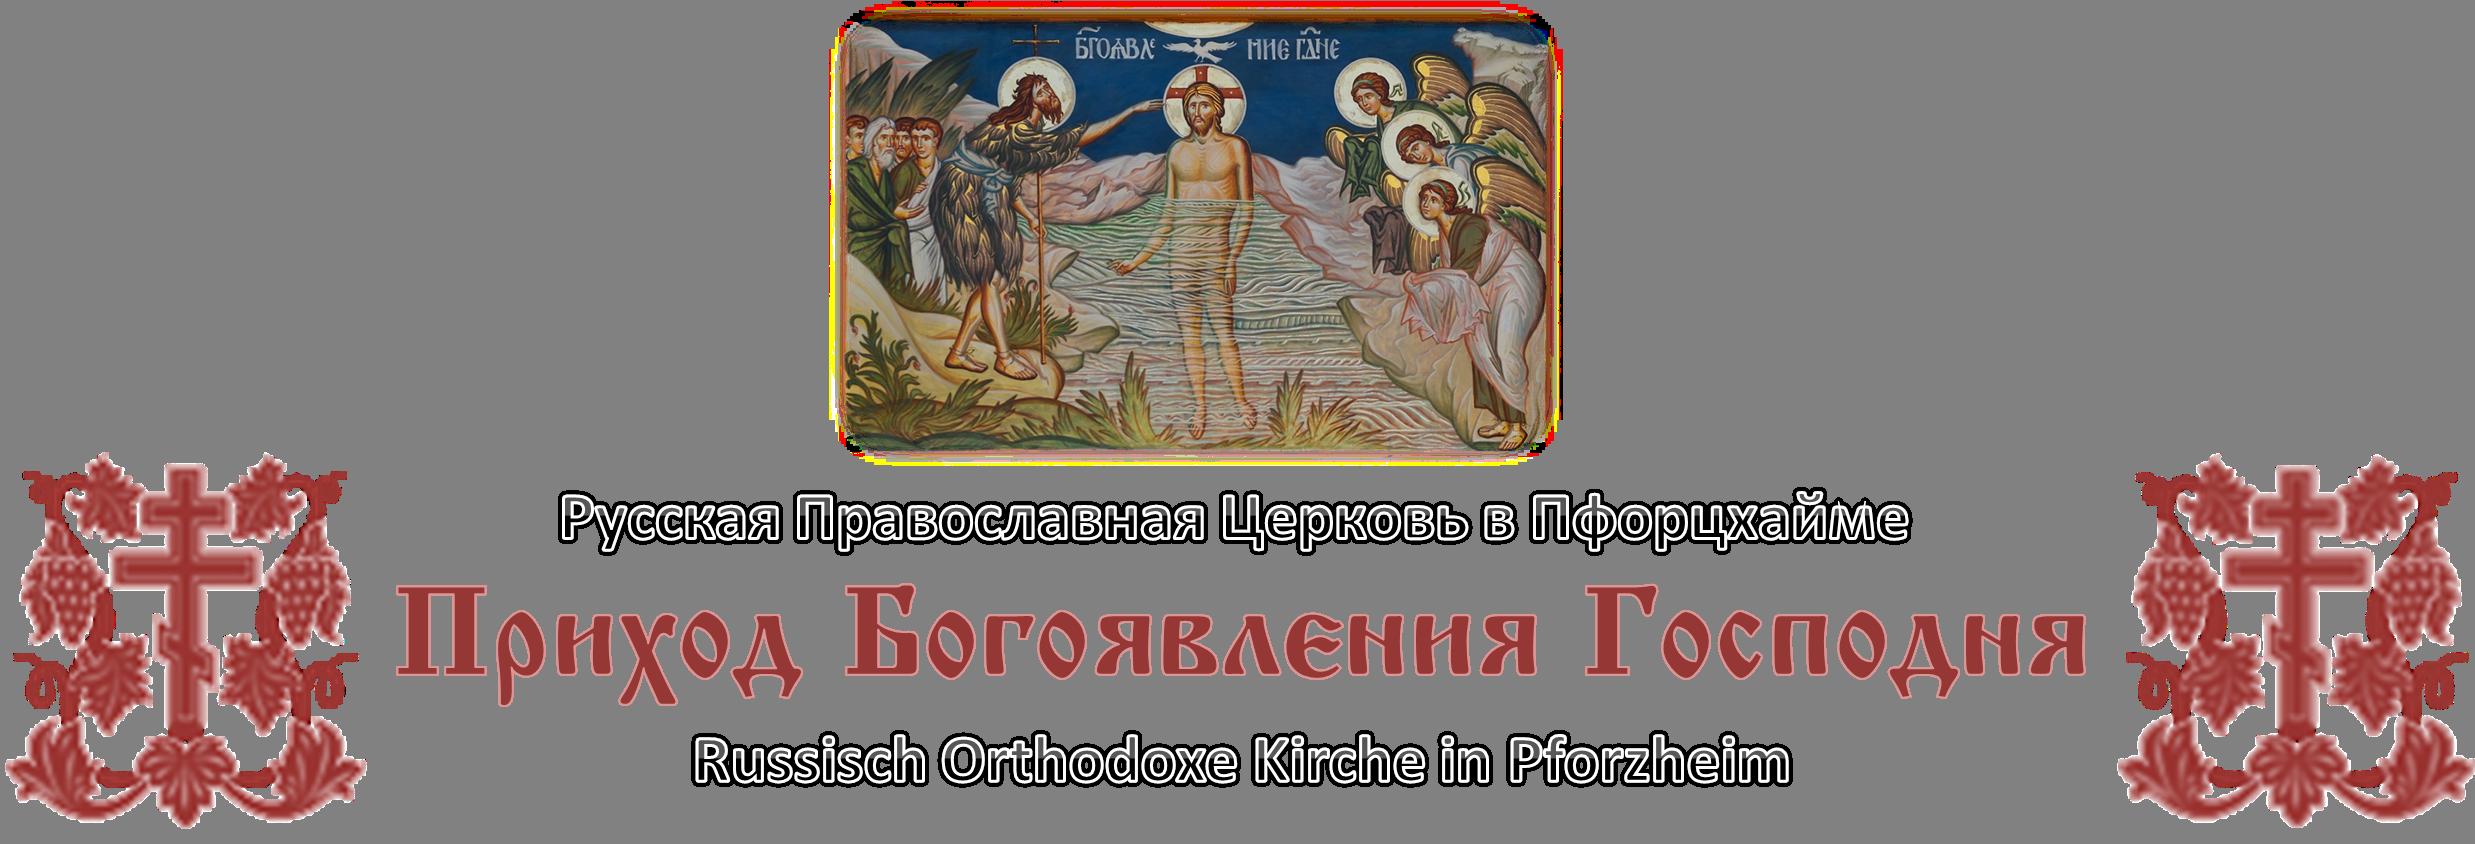 Русская Православная Церковь Pforzheim